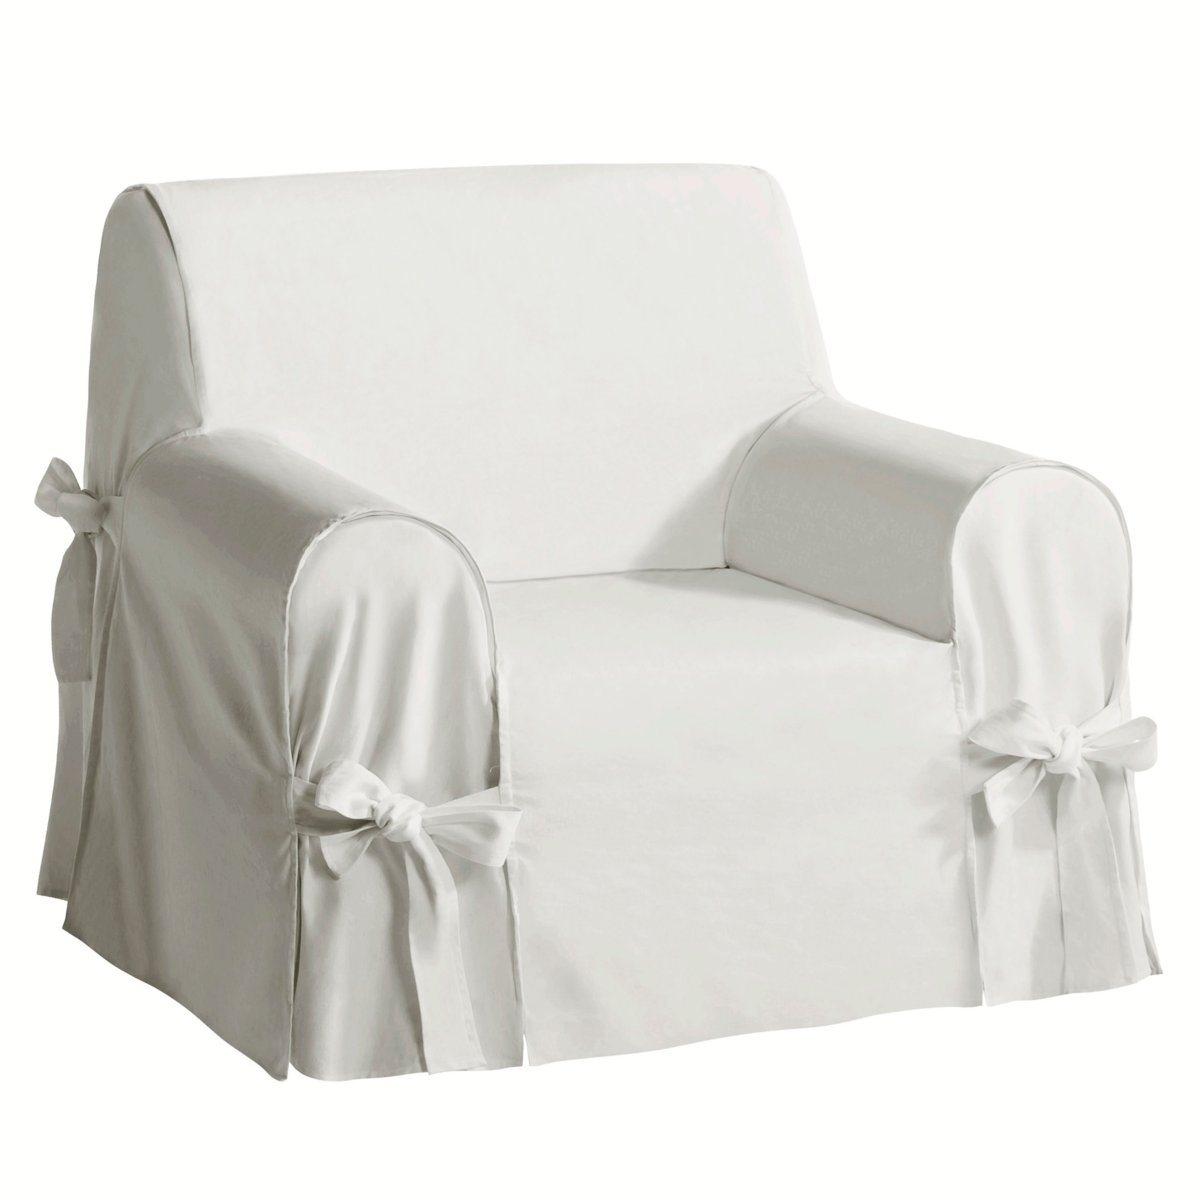 Чехол на кресло из льна и хлопка, JIMI